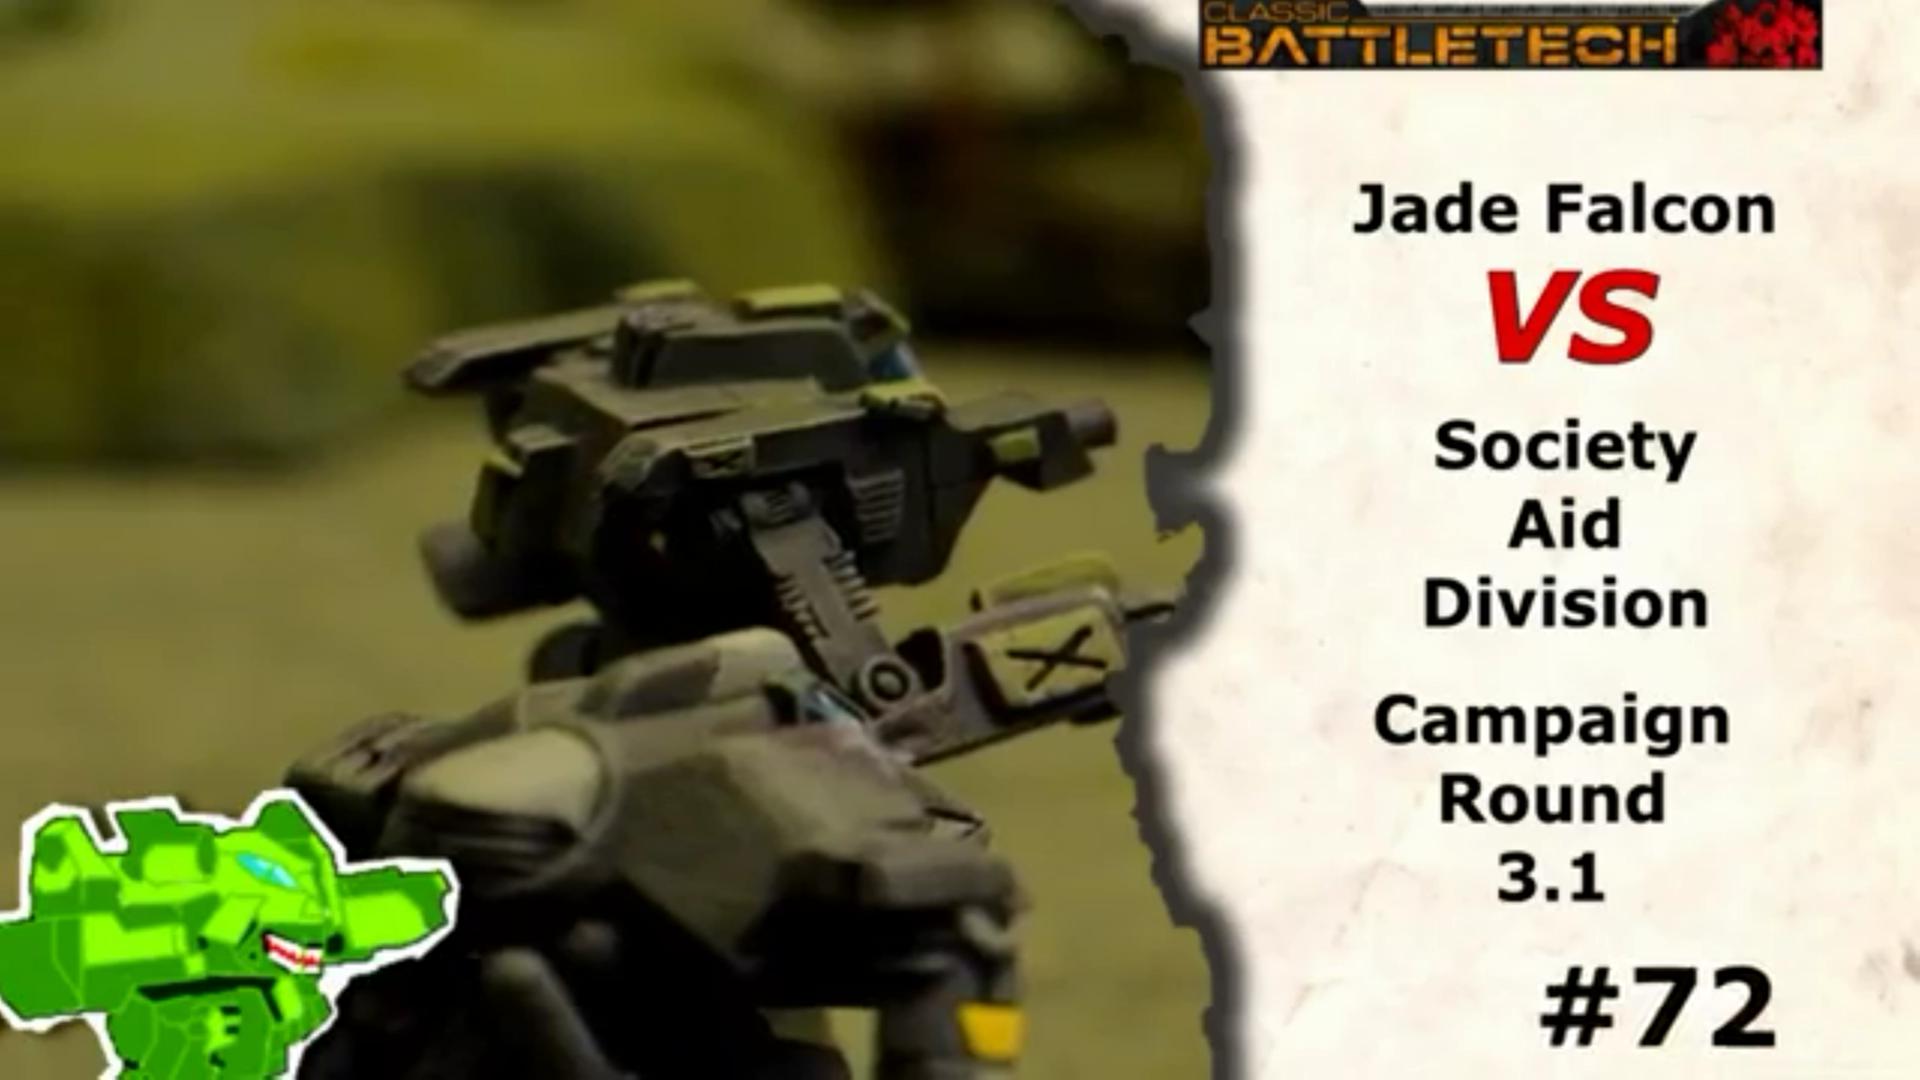 #72 Jade Falcon vs. Society Aid Division